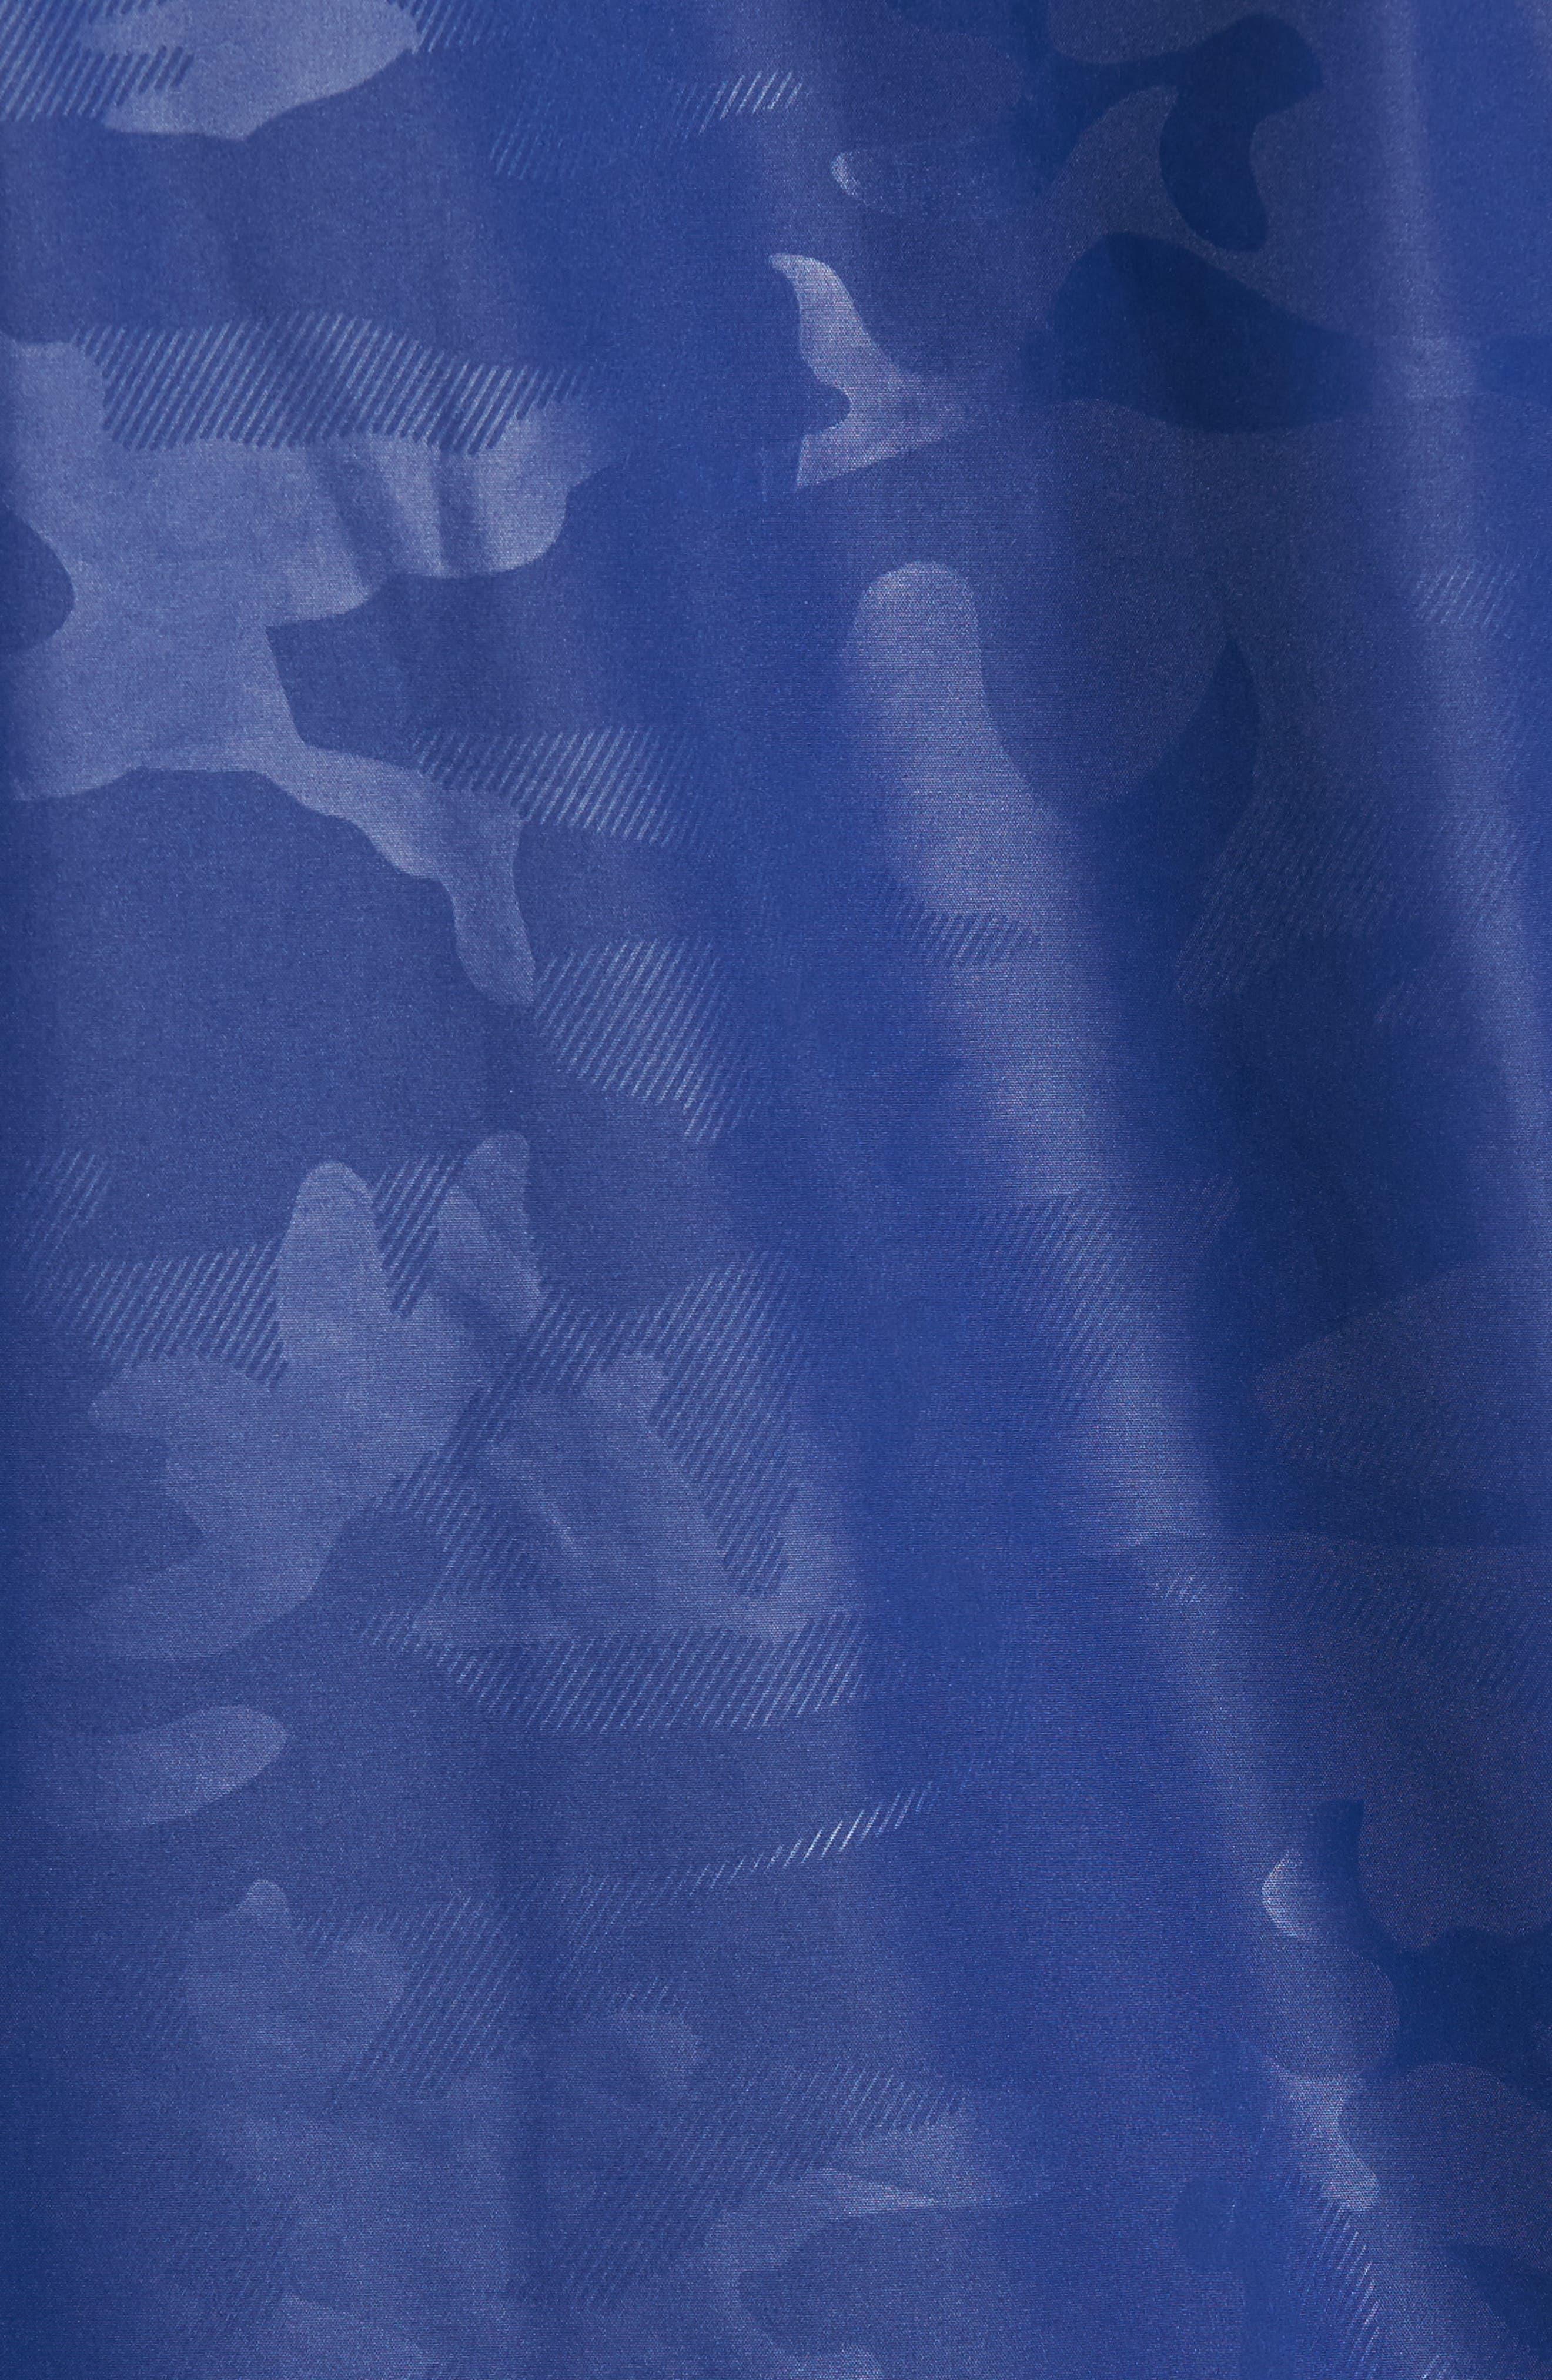 Camou Rudder Waterproof Jacket,                             Alternate thumbnail 5, color,                             Twilight Blue